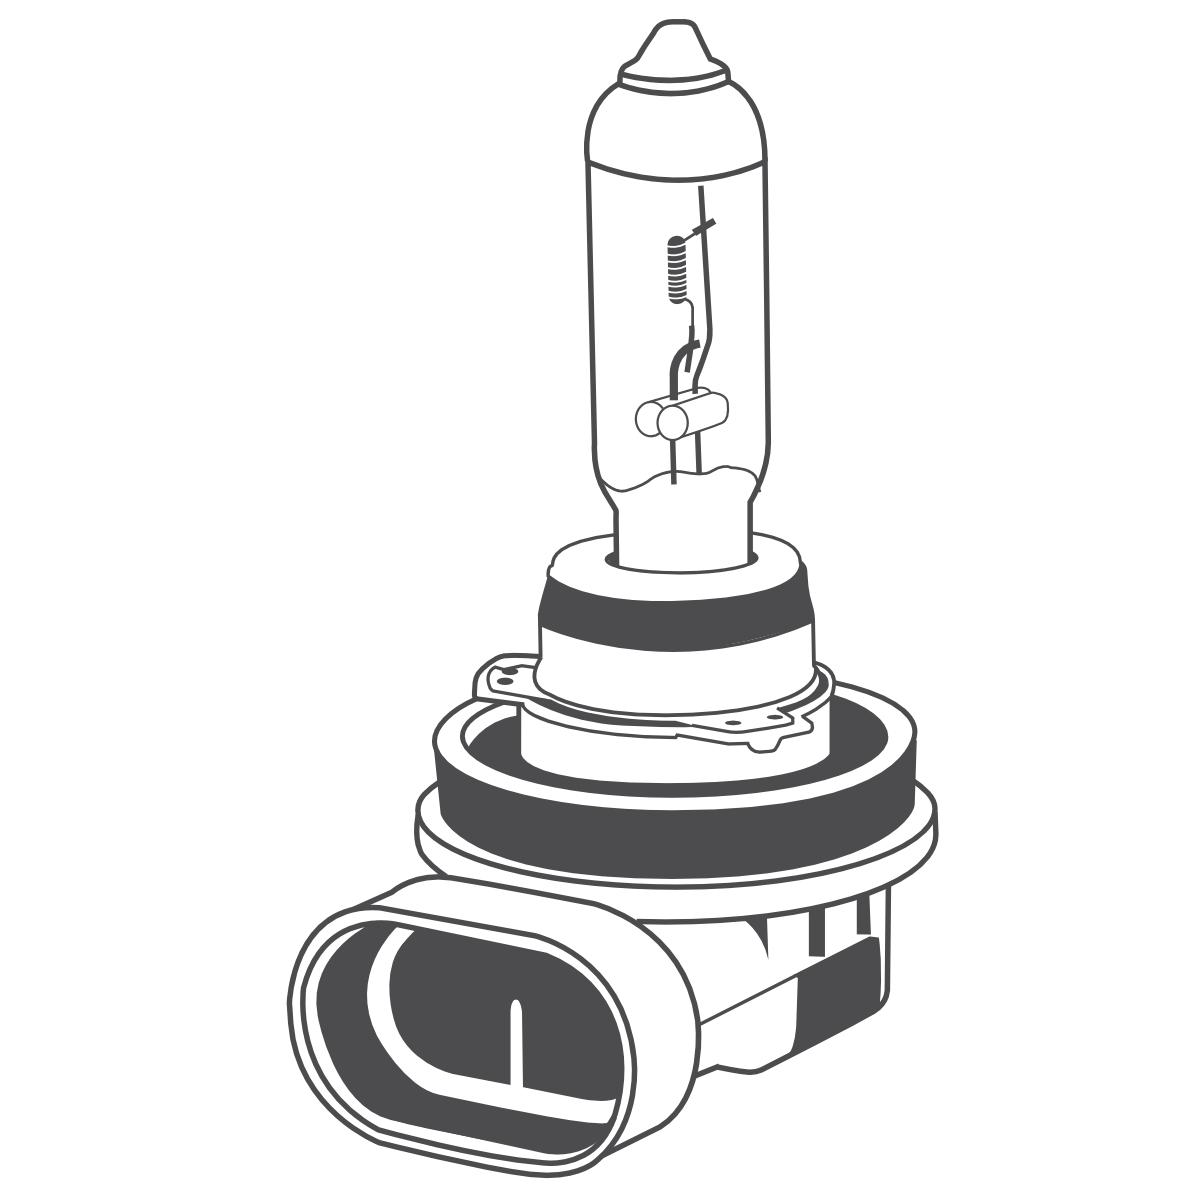 10x Brehma H11 Halogen Lampe 55w 12v Pgj19 2 Gluhlampe Autolampe Gluhbirne